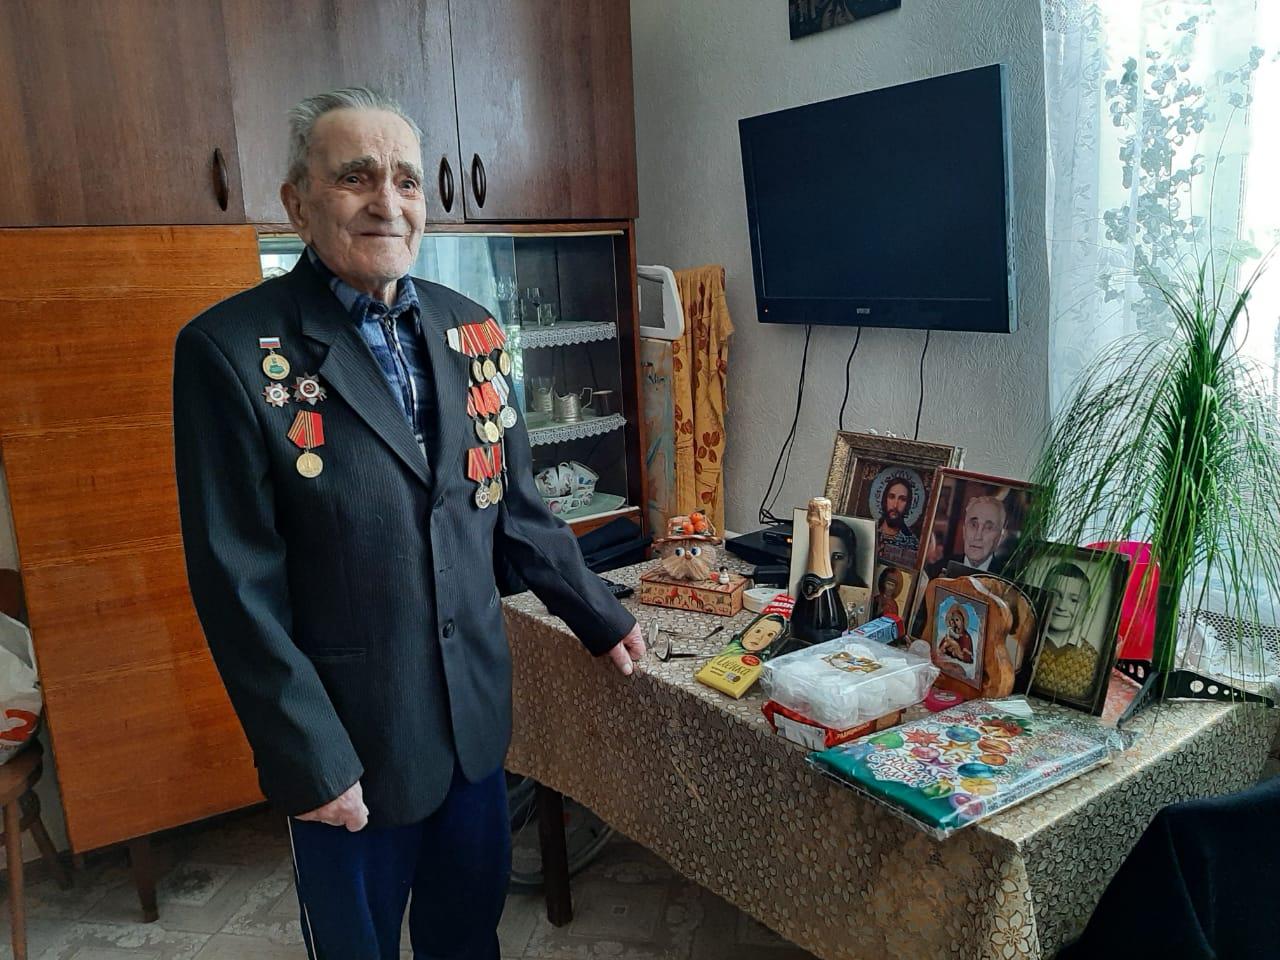 ЗАТО Северск, Кучин Дмитрий Евдокимович